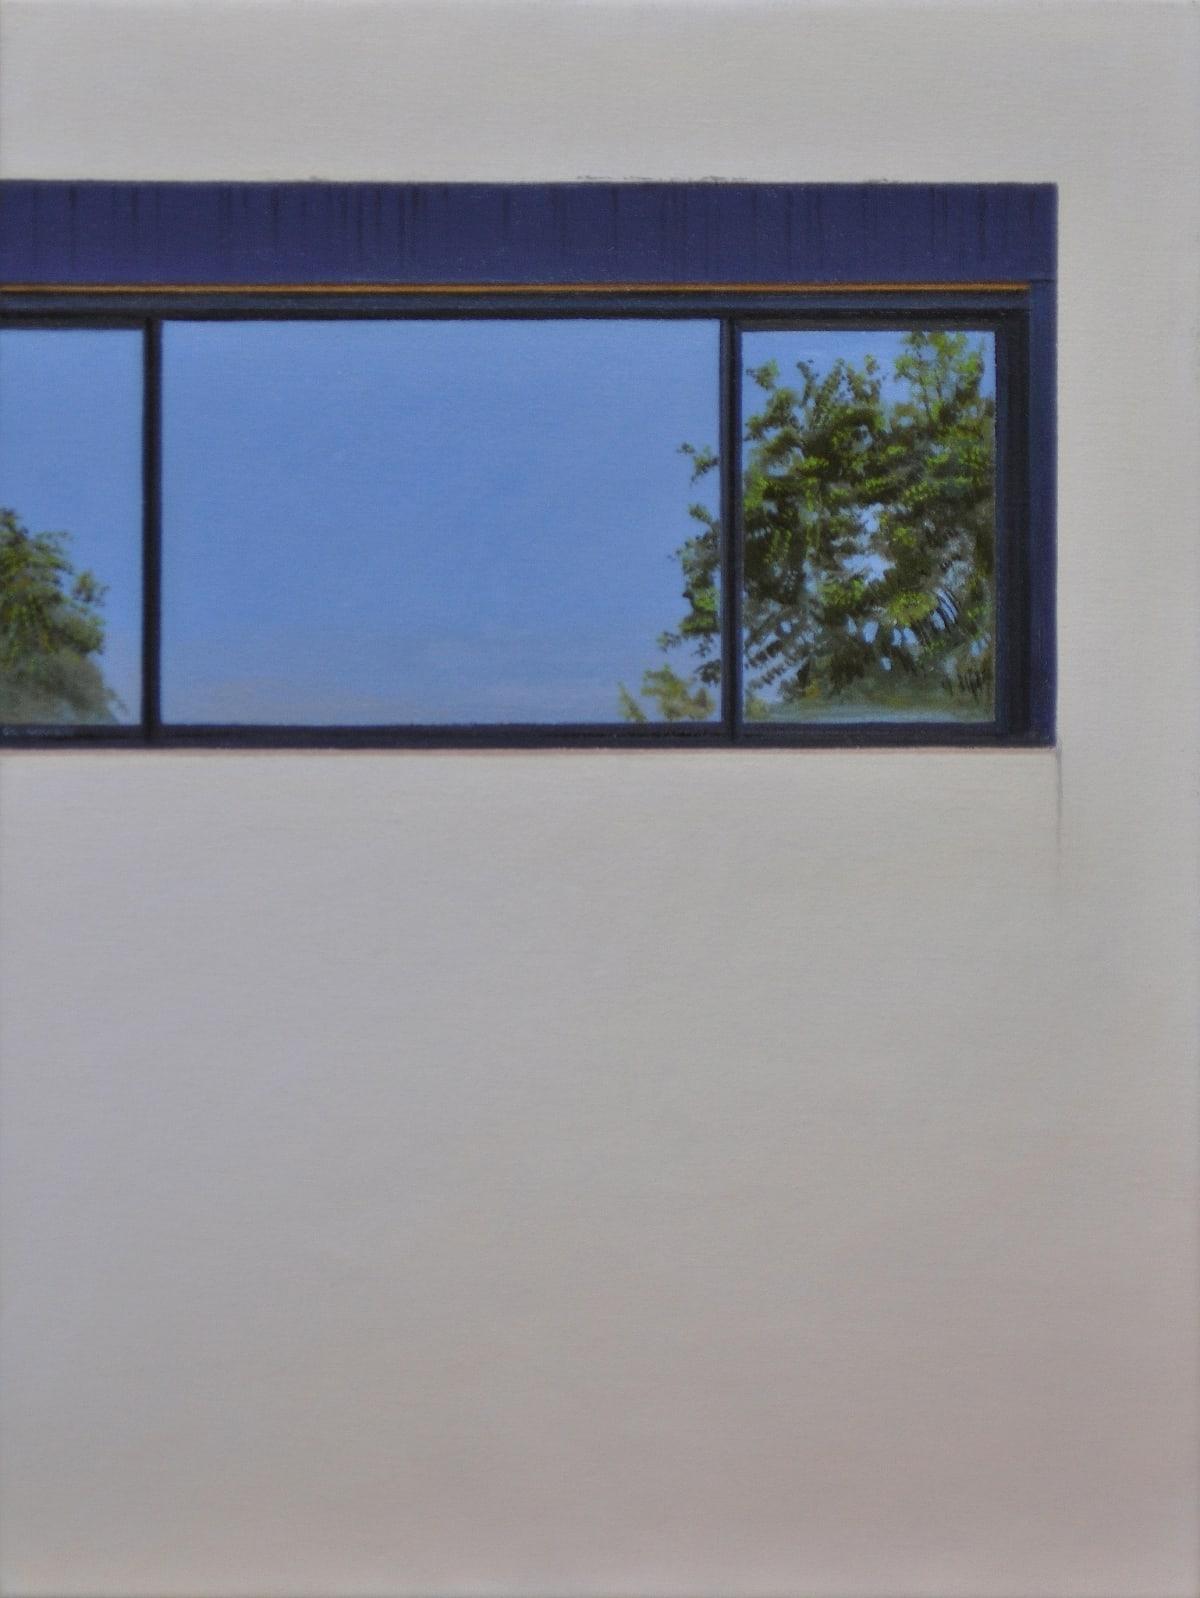 Carl Laubin Fenetre en Longueur, 2015 Oil on canvas 41 x 30 cm